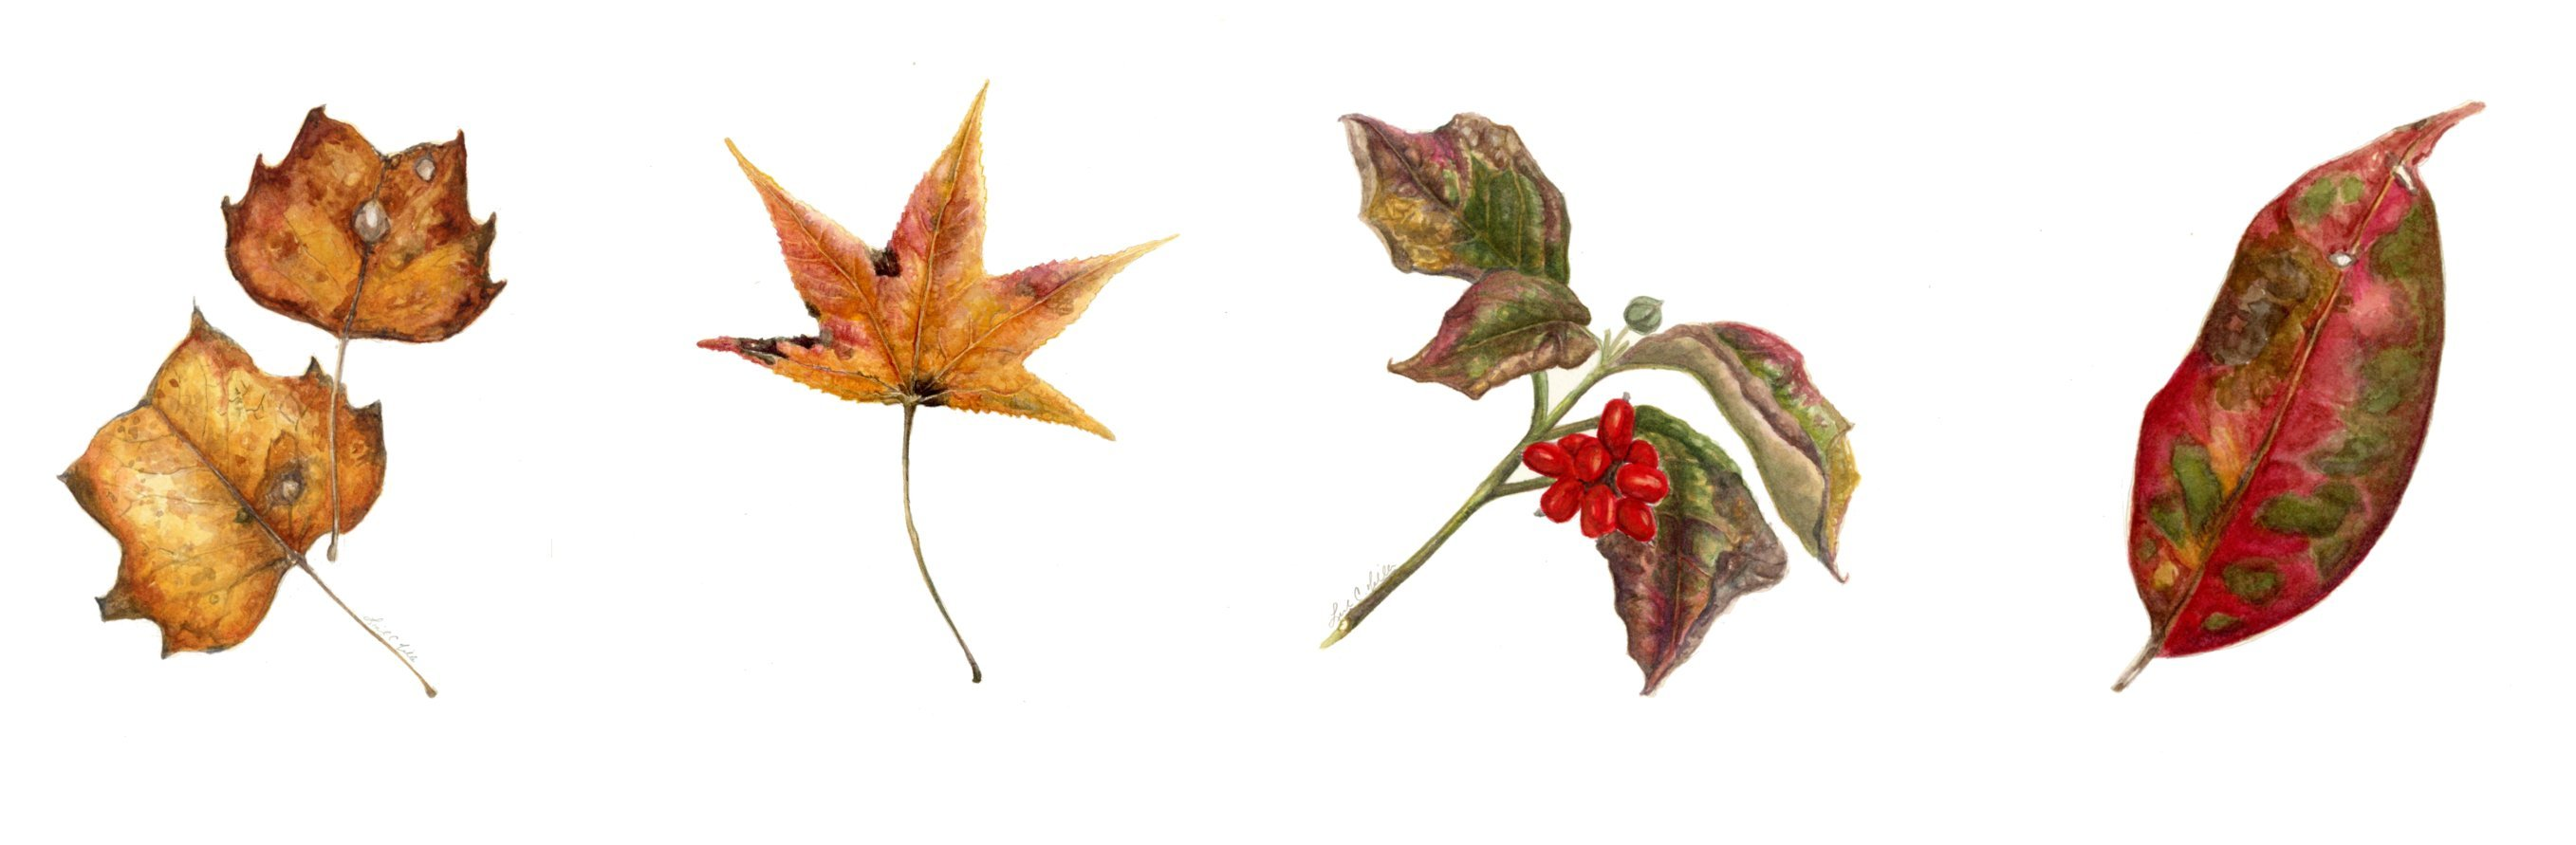 Create a nature journal of autumn leaves | ArtPlantae